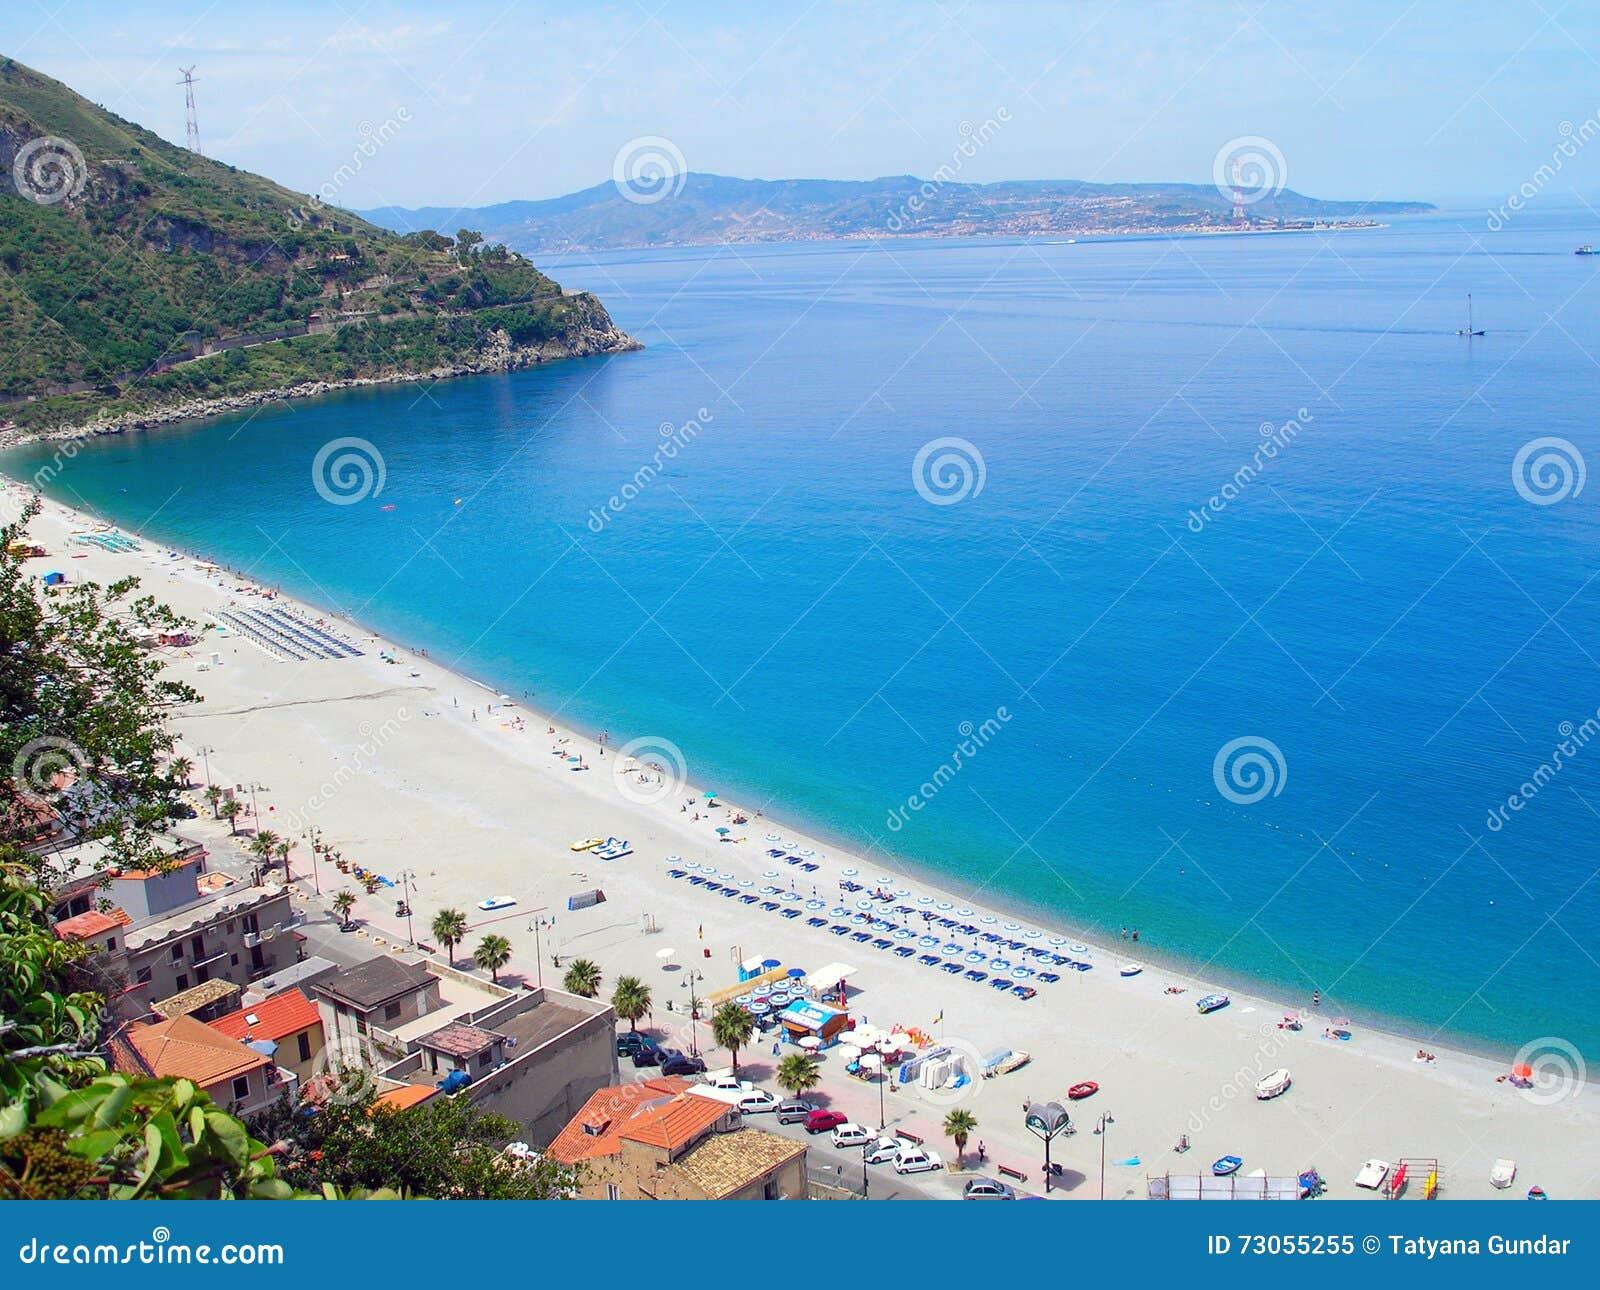 Villa san giovanni italie de plage image stock image for Amaretti arredamenti villa san giovanni